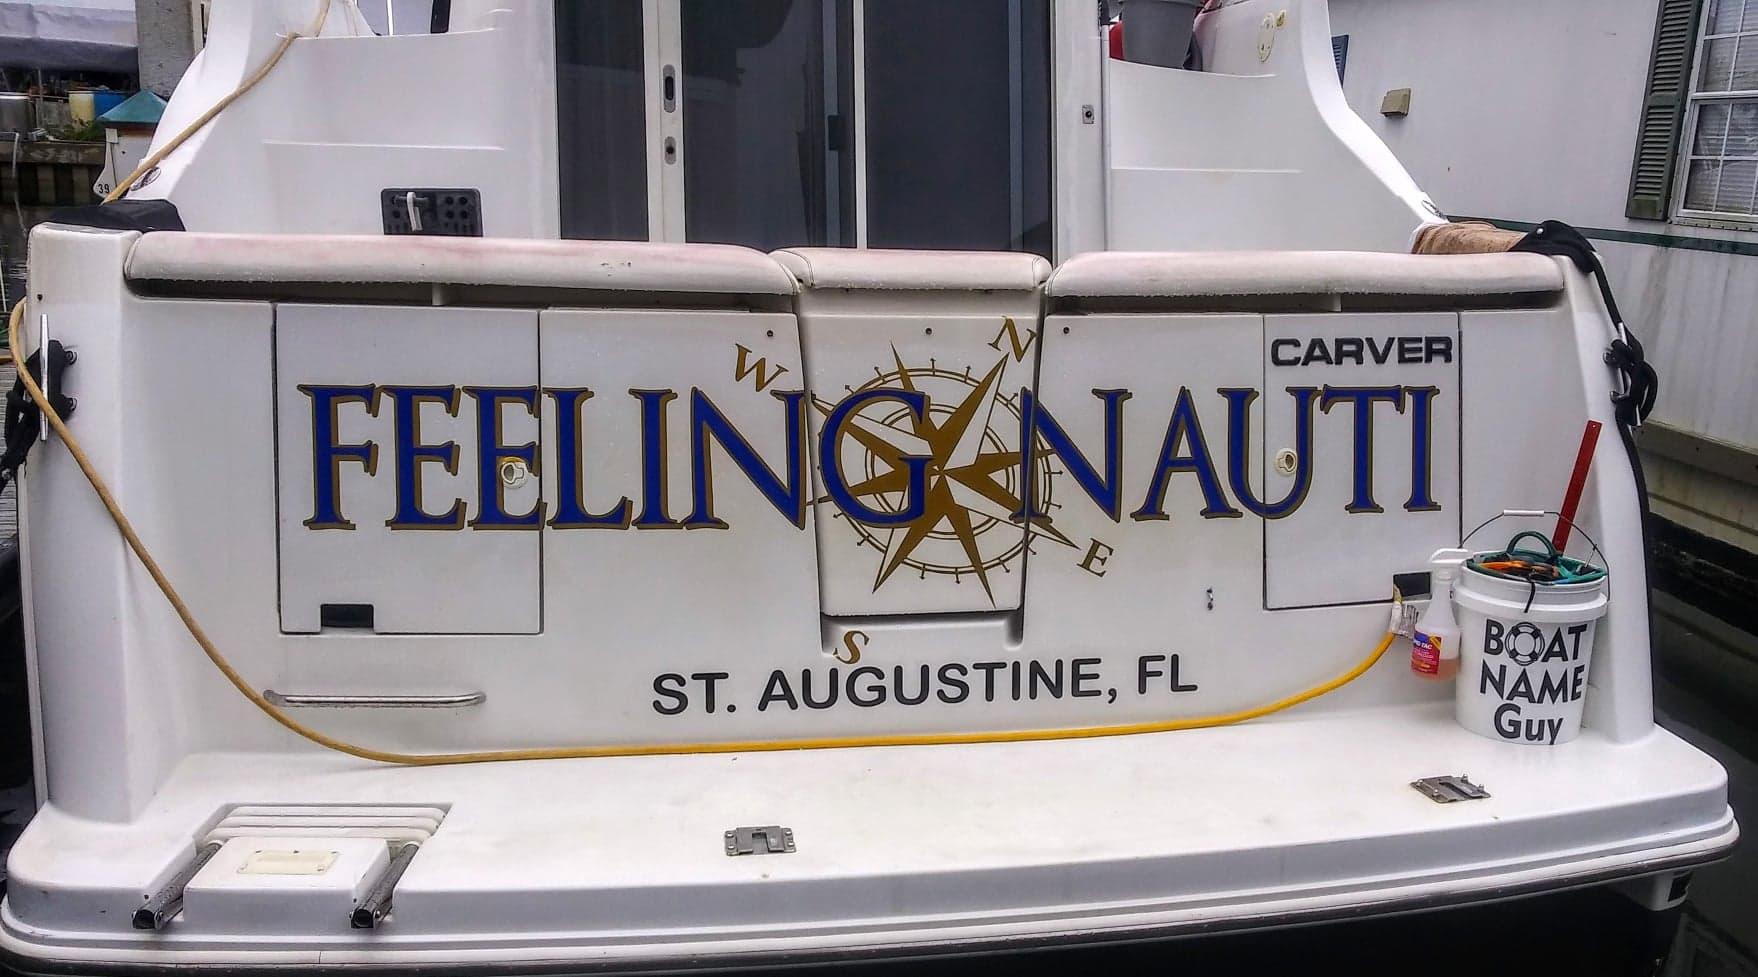 Feeling Nauti Boat Name